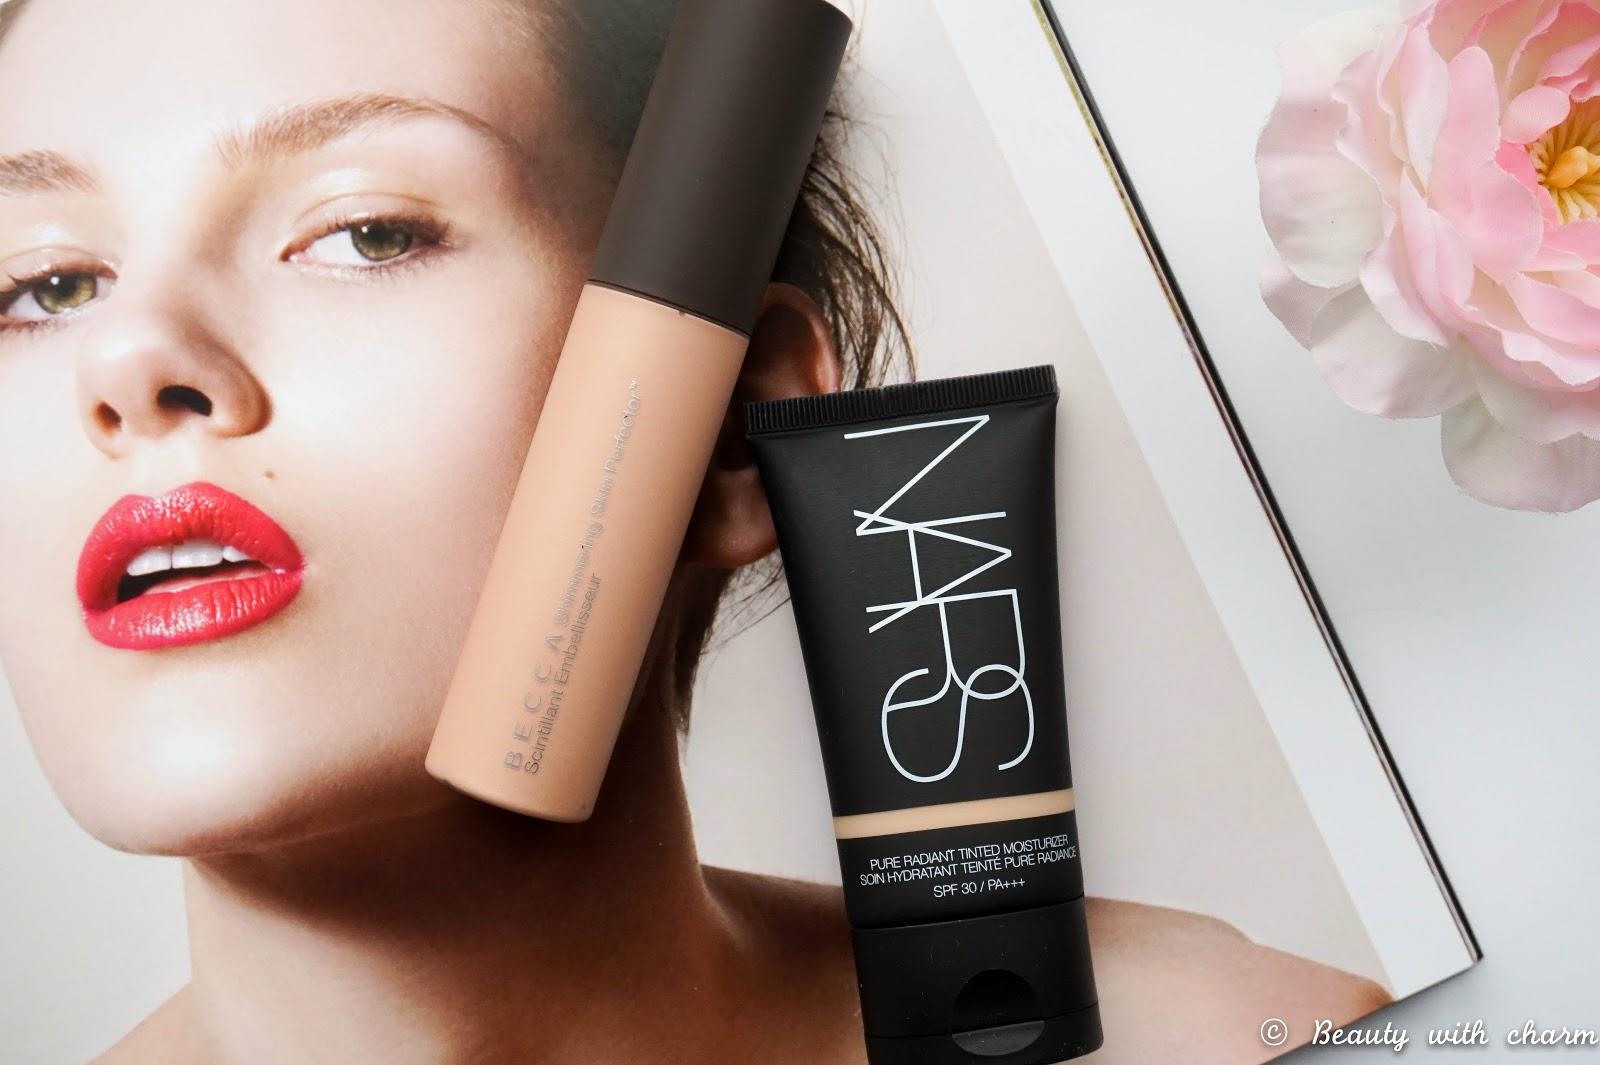 Mini Space NK Beauty Haul, BECCA Shimmering Skin Perfector in Opal, NARS Tinted Moisturiser in Alaska